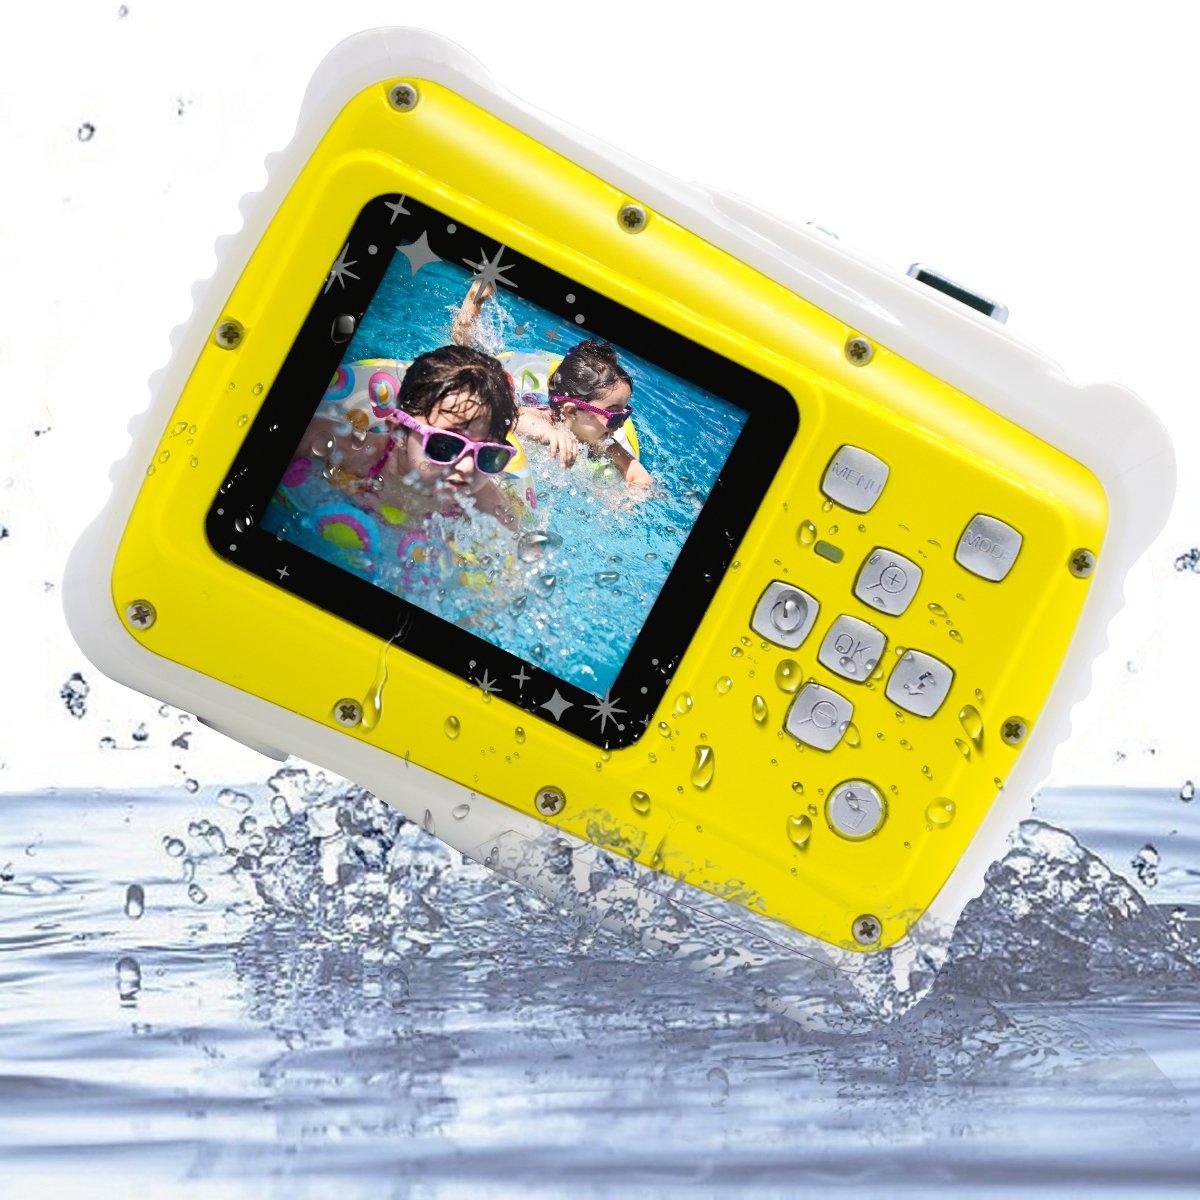 Kids Digital Camera, Vmotal Kids Waterproof Camera 2.0 Inch TFT Display with 8X Digital Zoom 8MP Waterproof Camera for Children (Yellow)